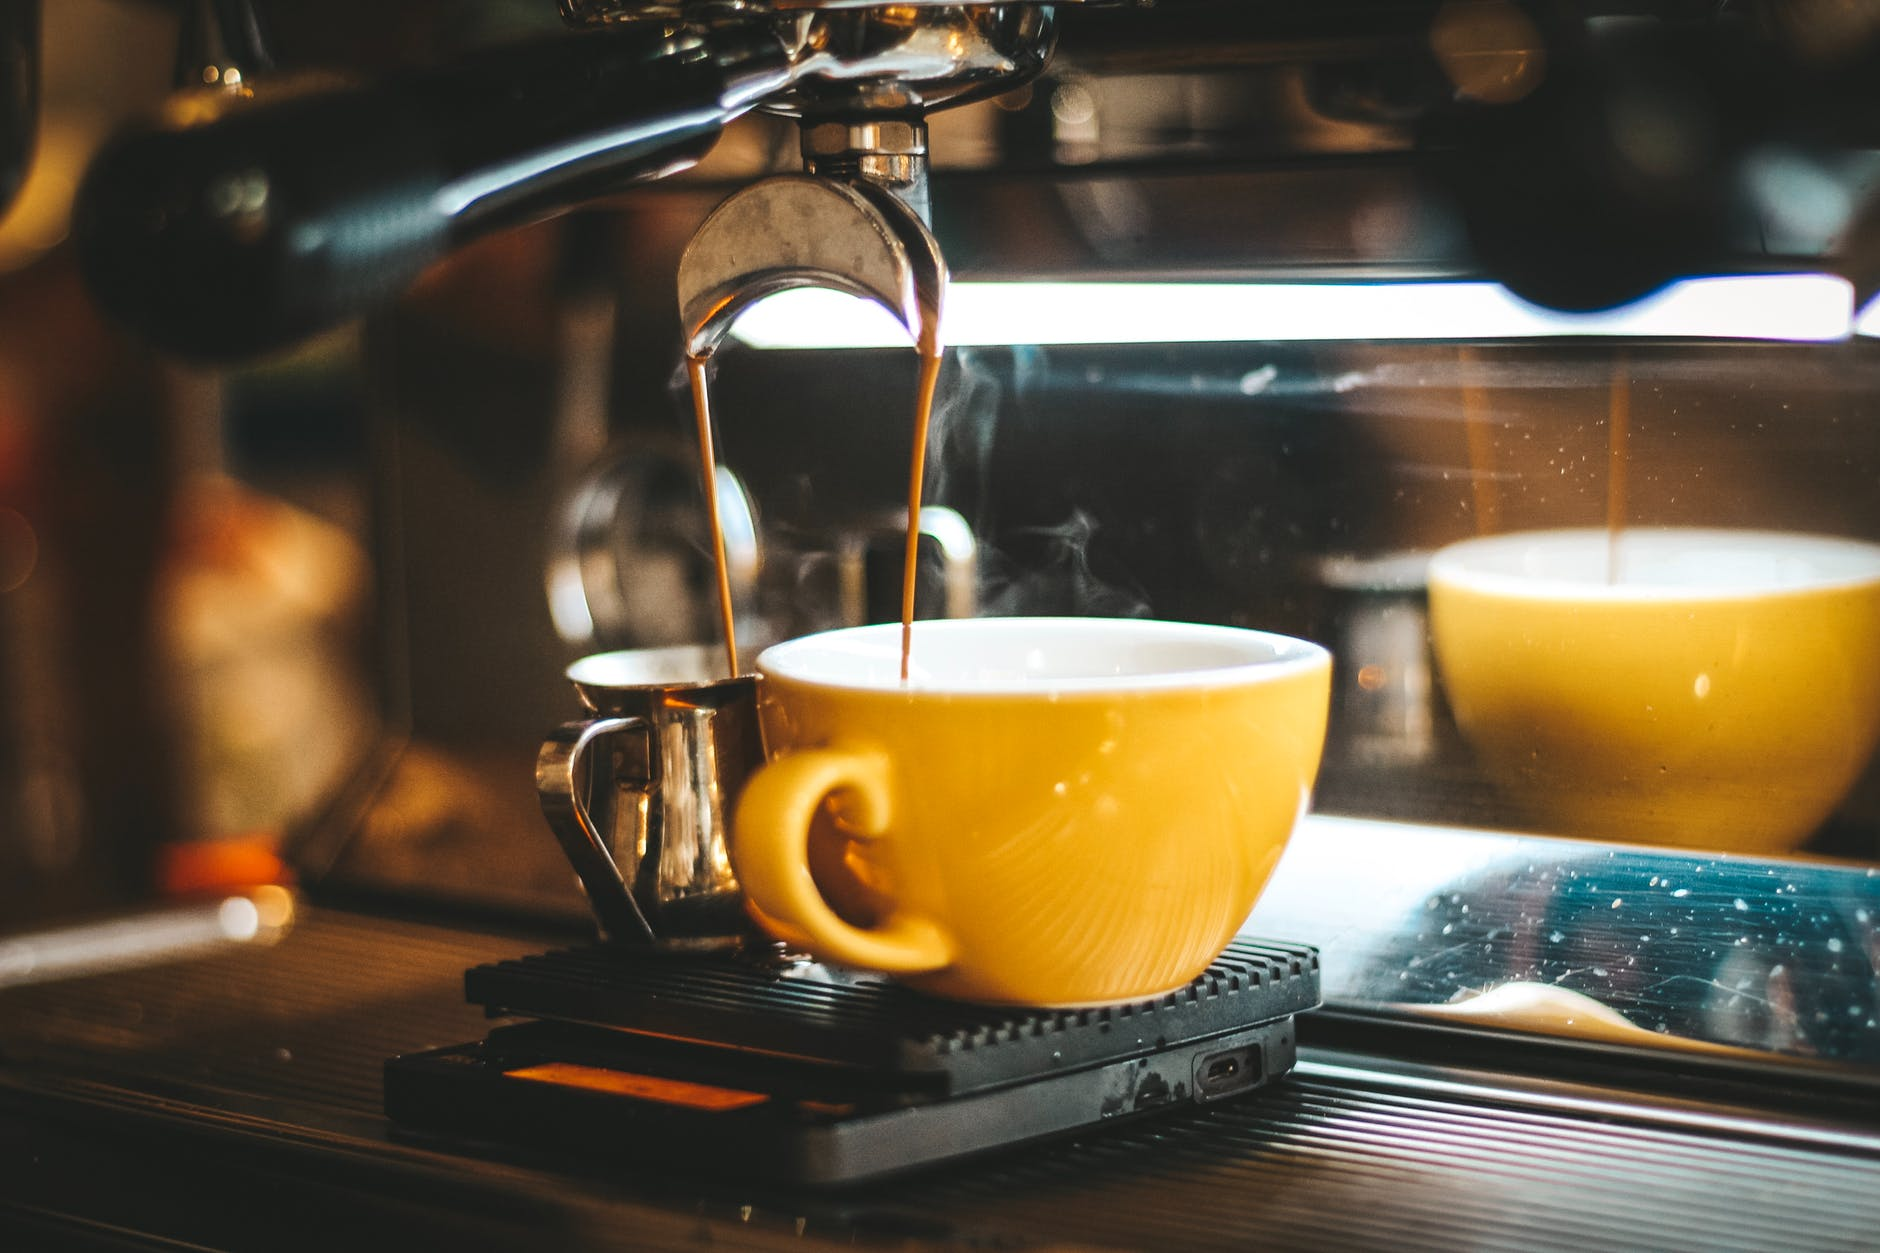 espresso machine dispensing on two mugs